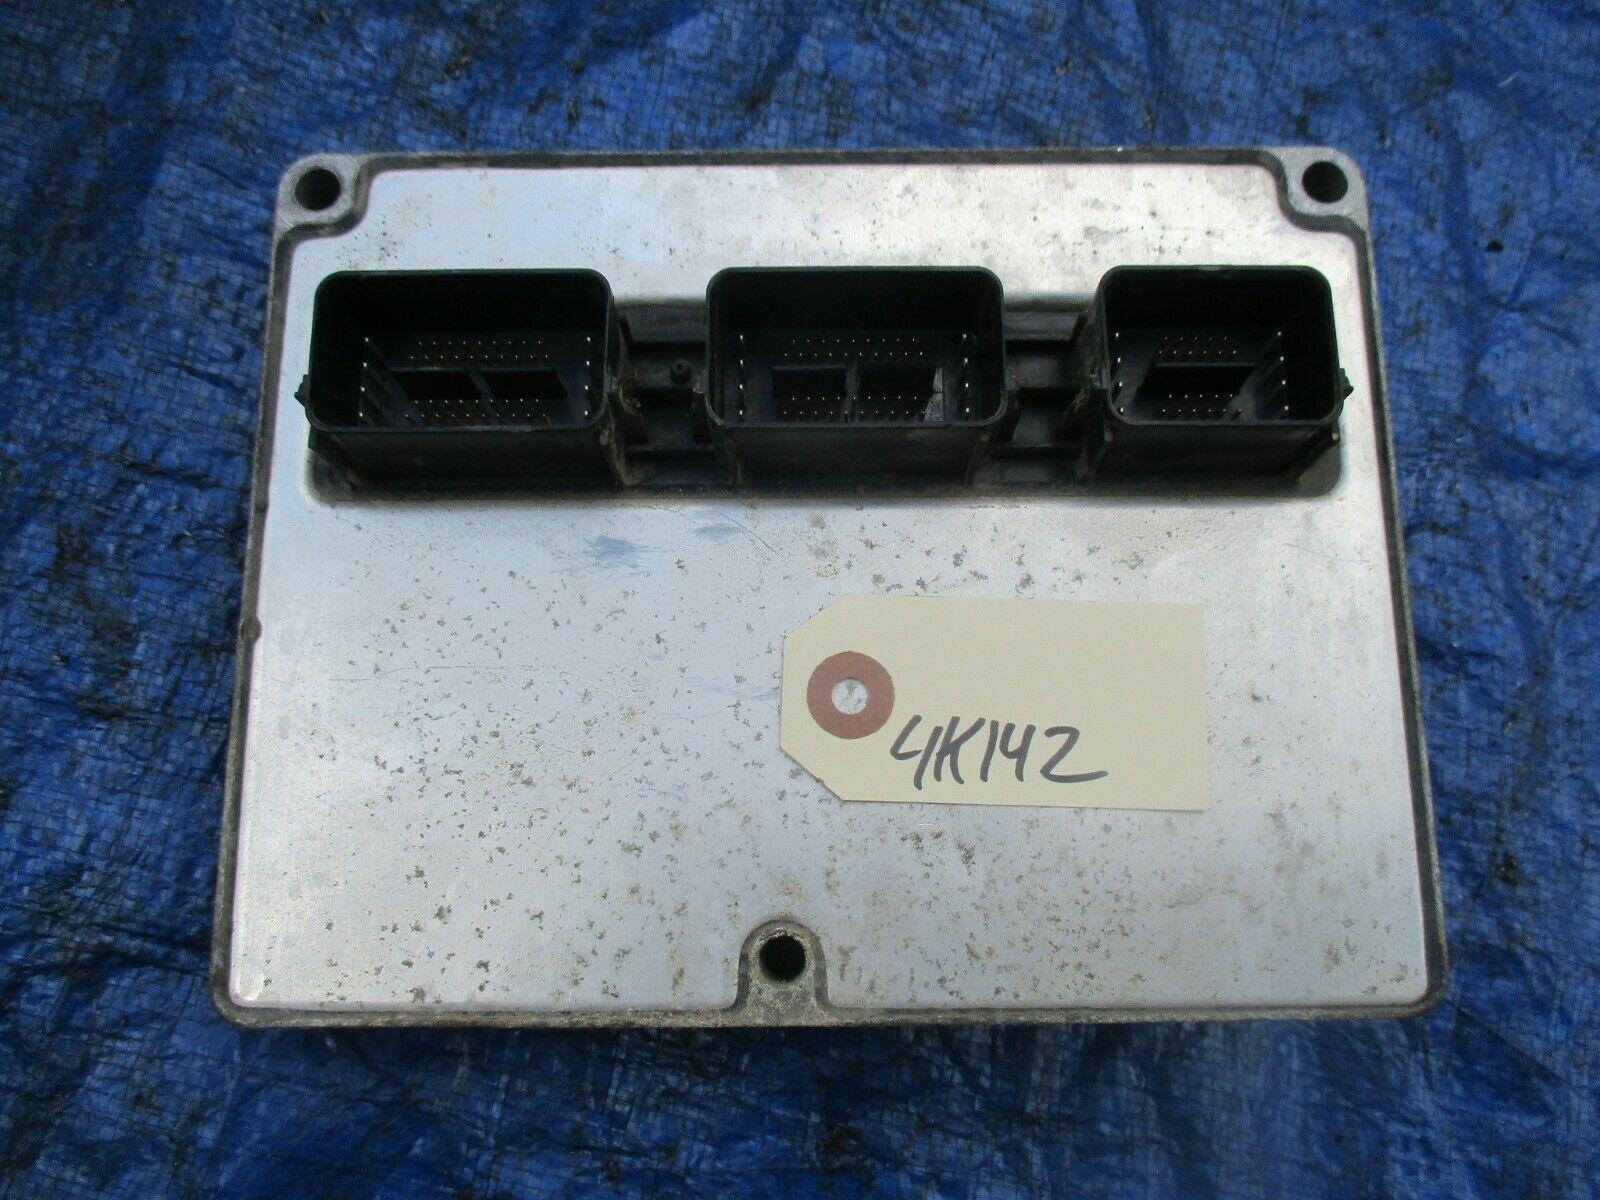 2005 Ford F350 diesel 6.0 engine computer ECM DPU-442 5C3A-12A650-KNB PCM122 ECU - $249.99